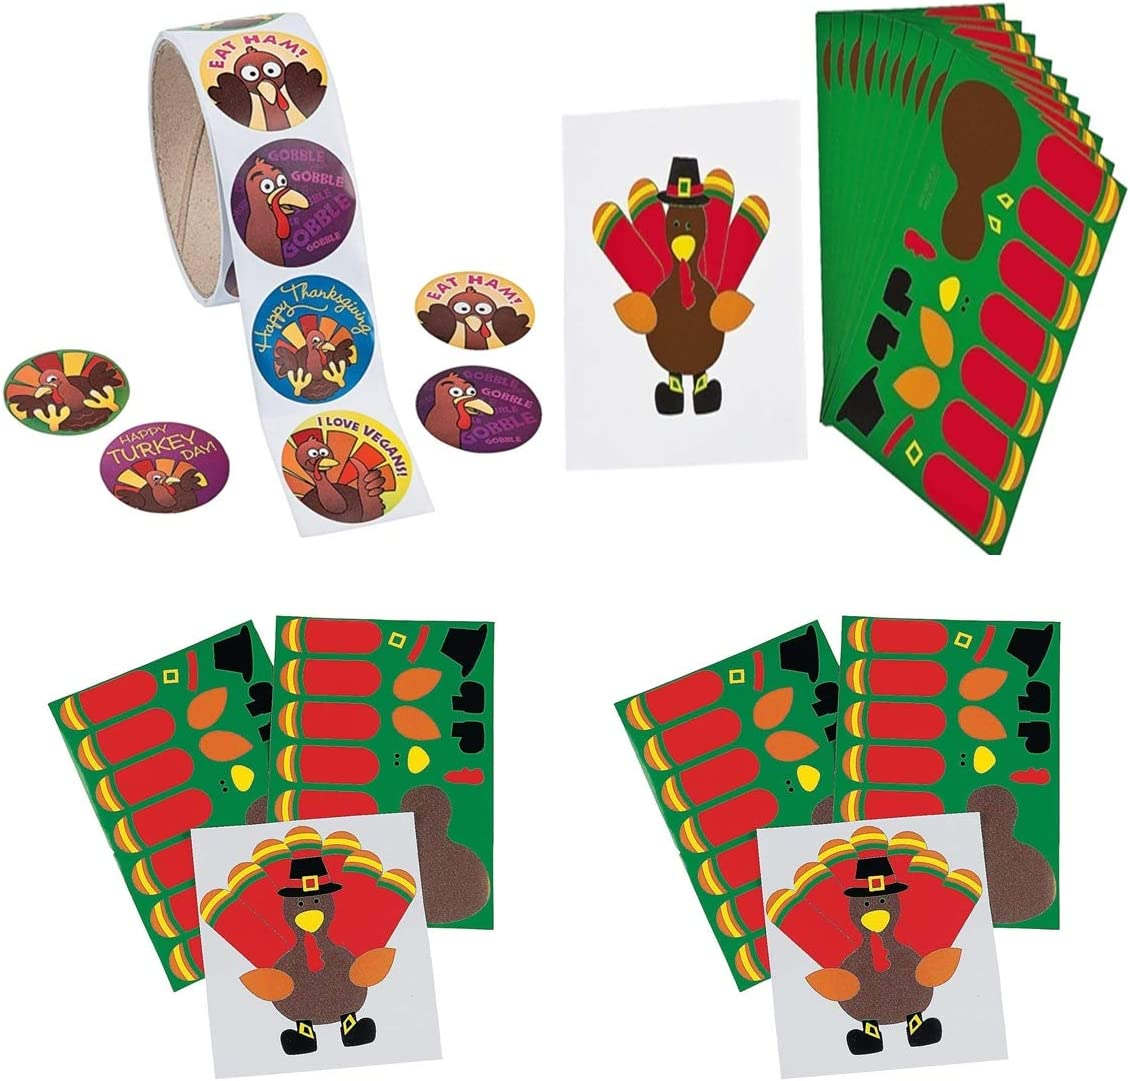 Make a Turkey Sticker Sheets Funny Turkey Stickers Roll of 100 36